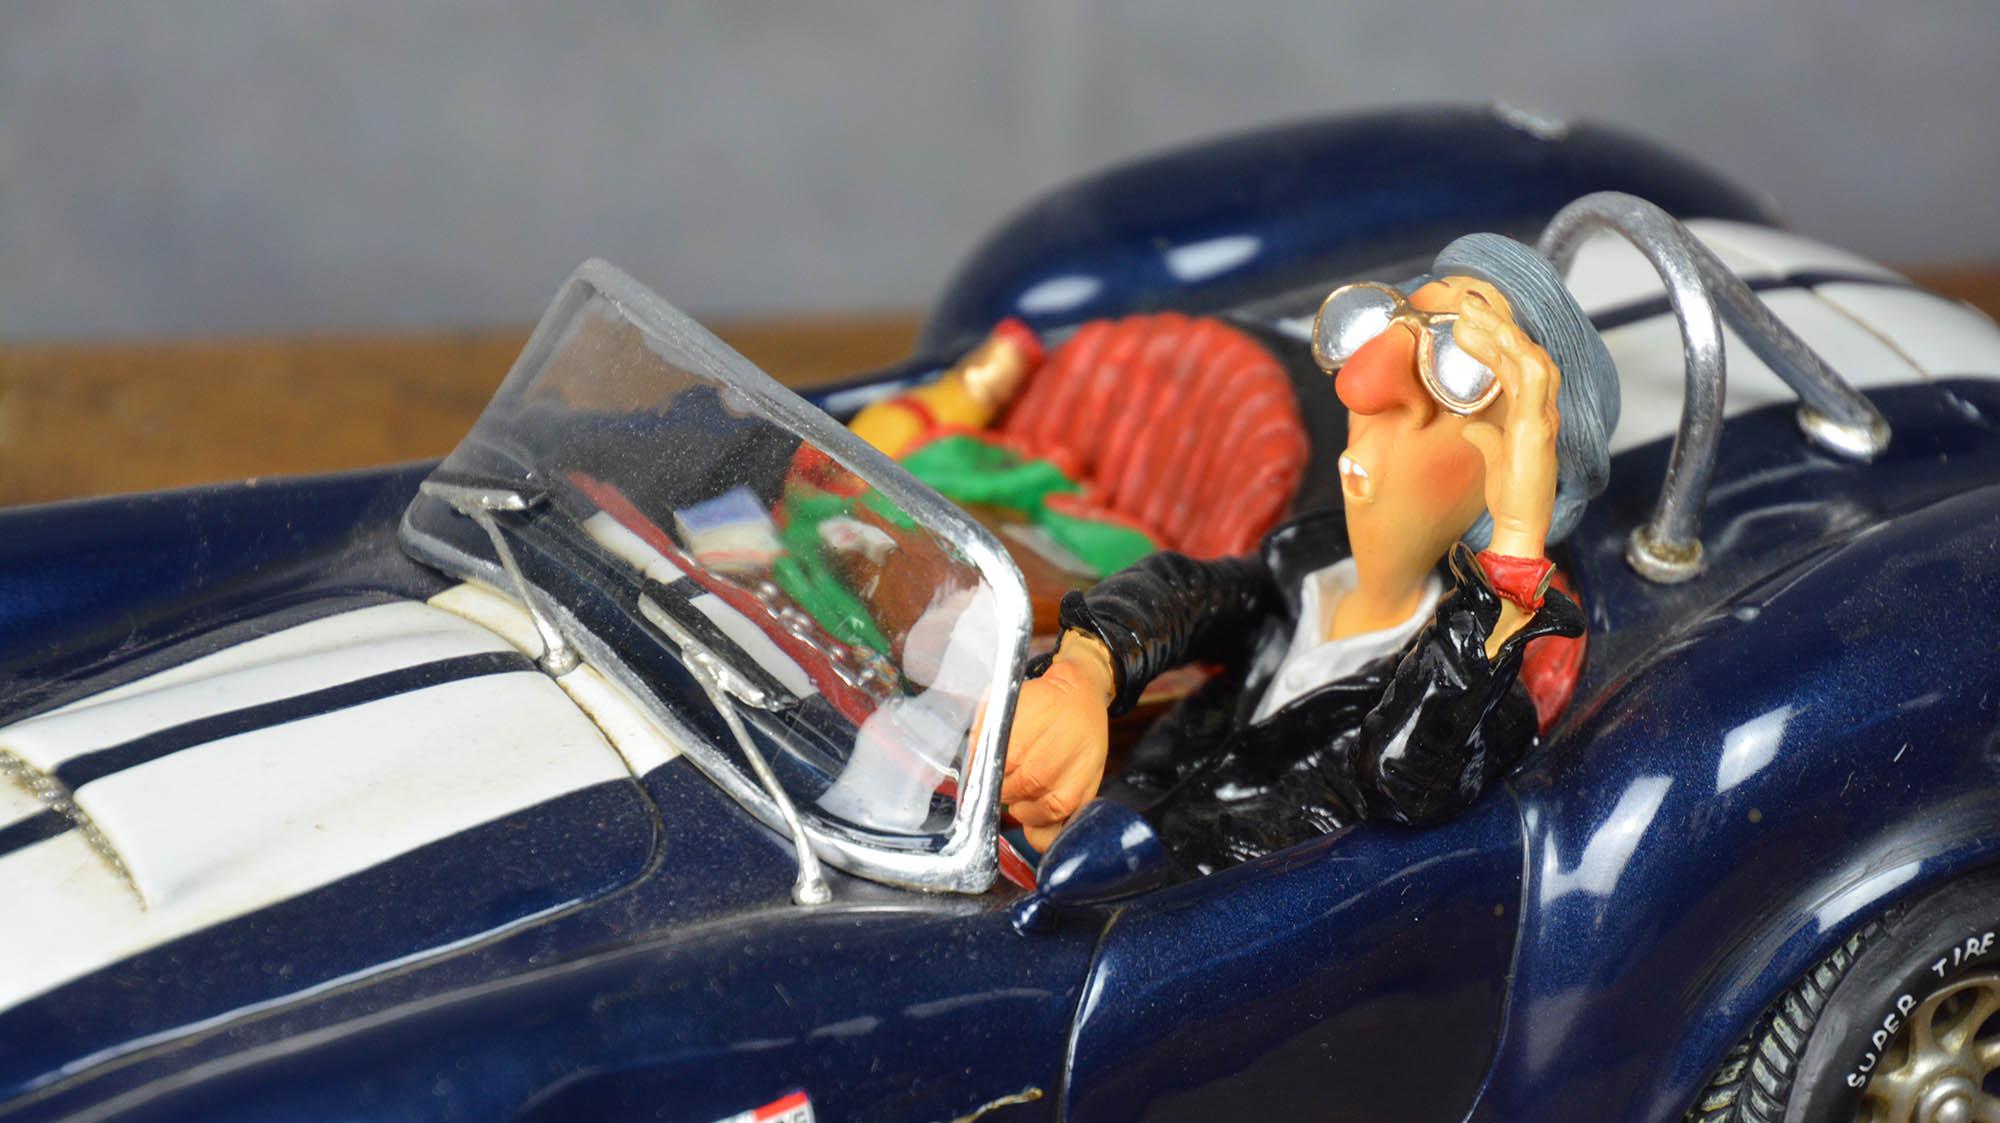 boutique figurine piece artisanale vehicule cobra parodie